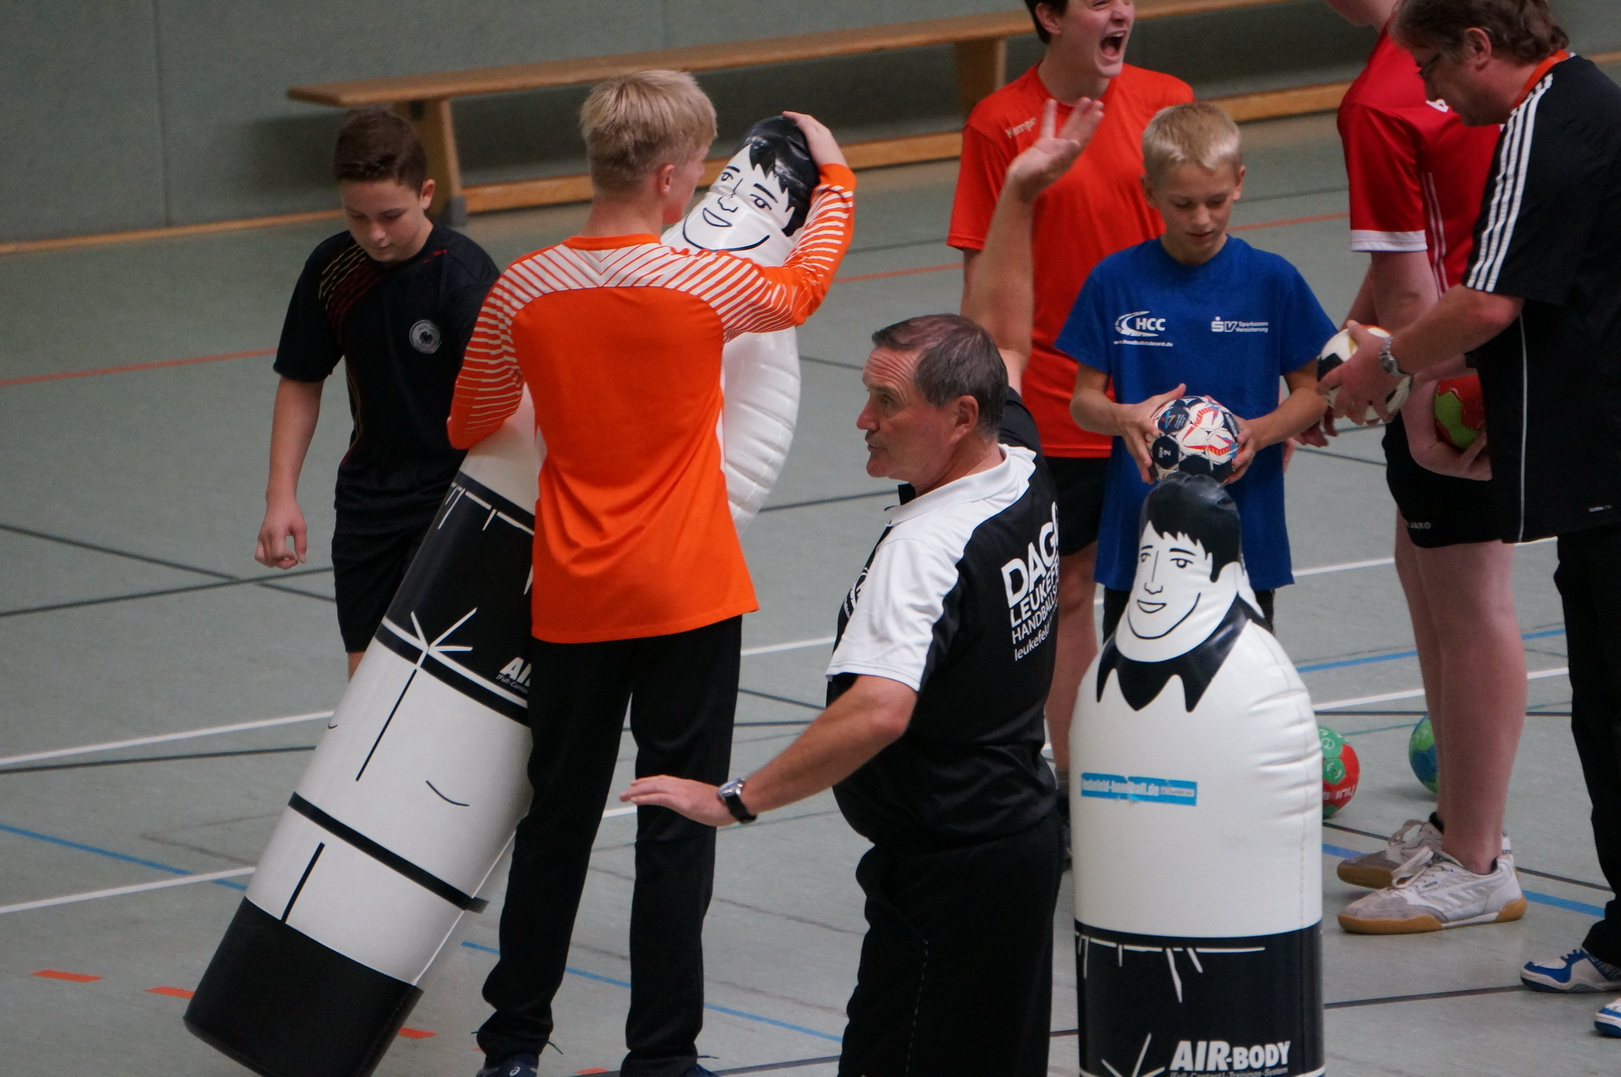 201808_Handballcamp_SDH_MG_240w